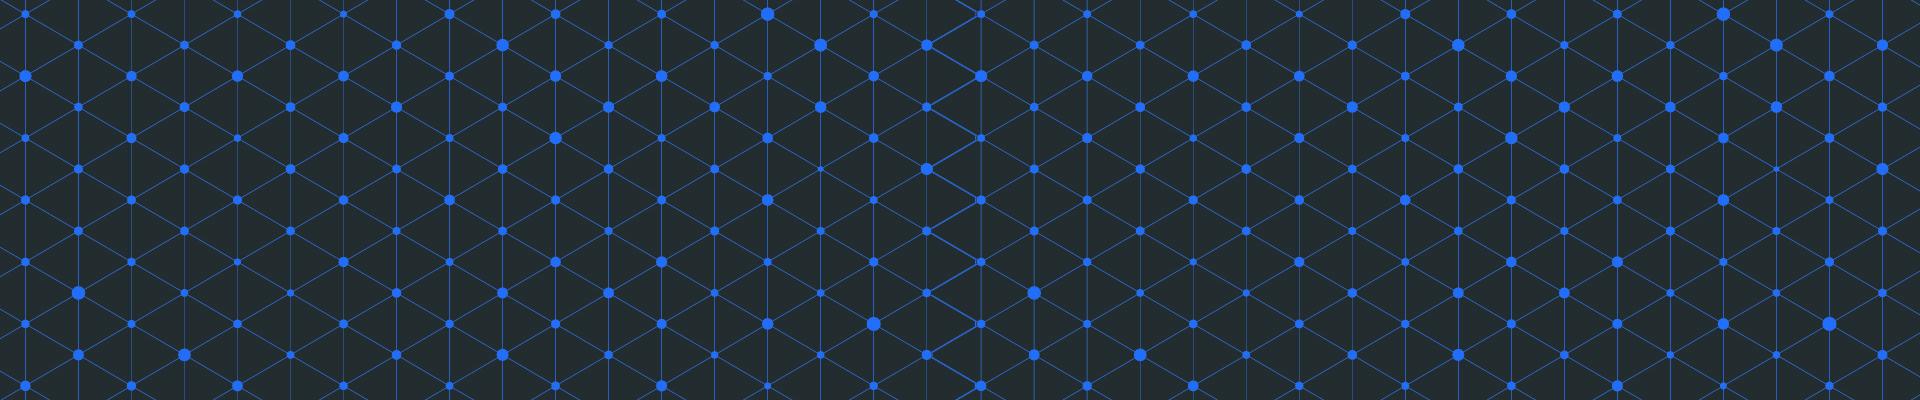 Altium NanoBoard